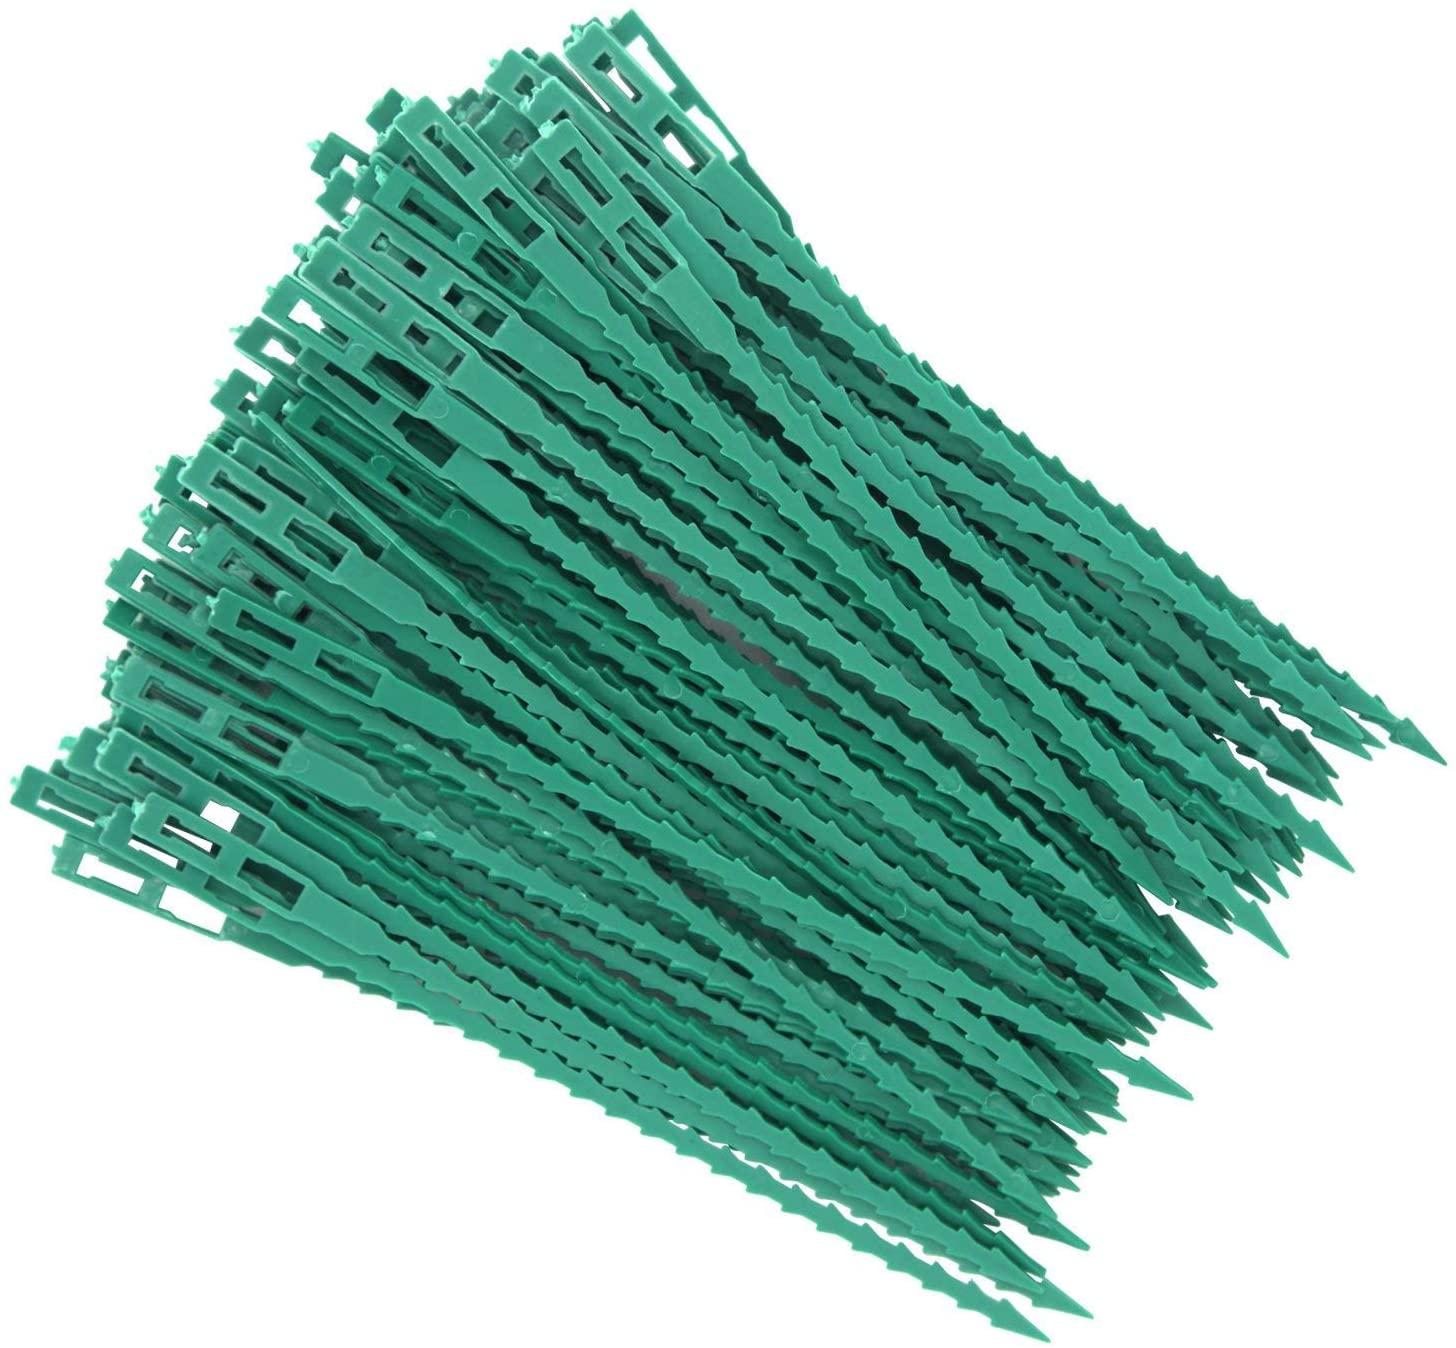 Ruthe 100 Pieces 6.7 Inch Flexible Plastic Twist Ties, Adjustable Garden Plant Twist Ties for Multi-Purpose Gardening Support DIY Tools